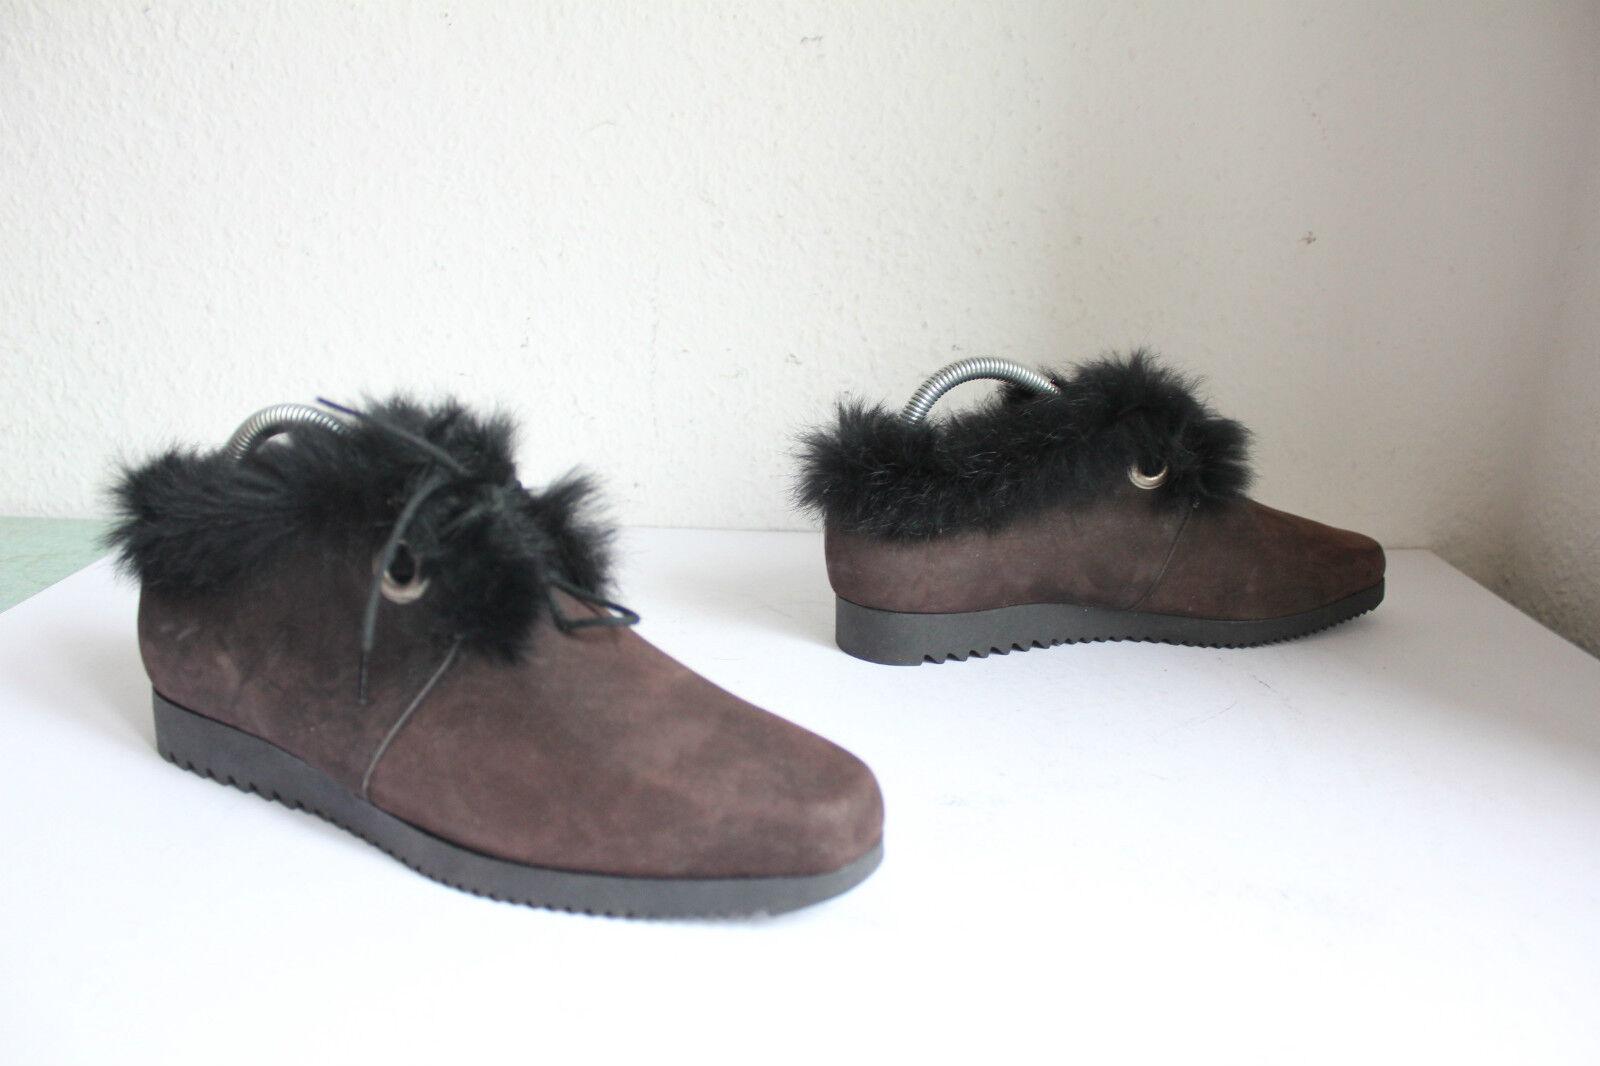 Fiesta elegante invierno schnürzapatos-semi botines nubukleder marrón eu eu eu 39, 5 bbaa57